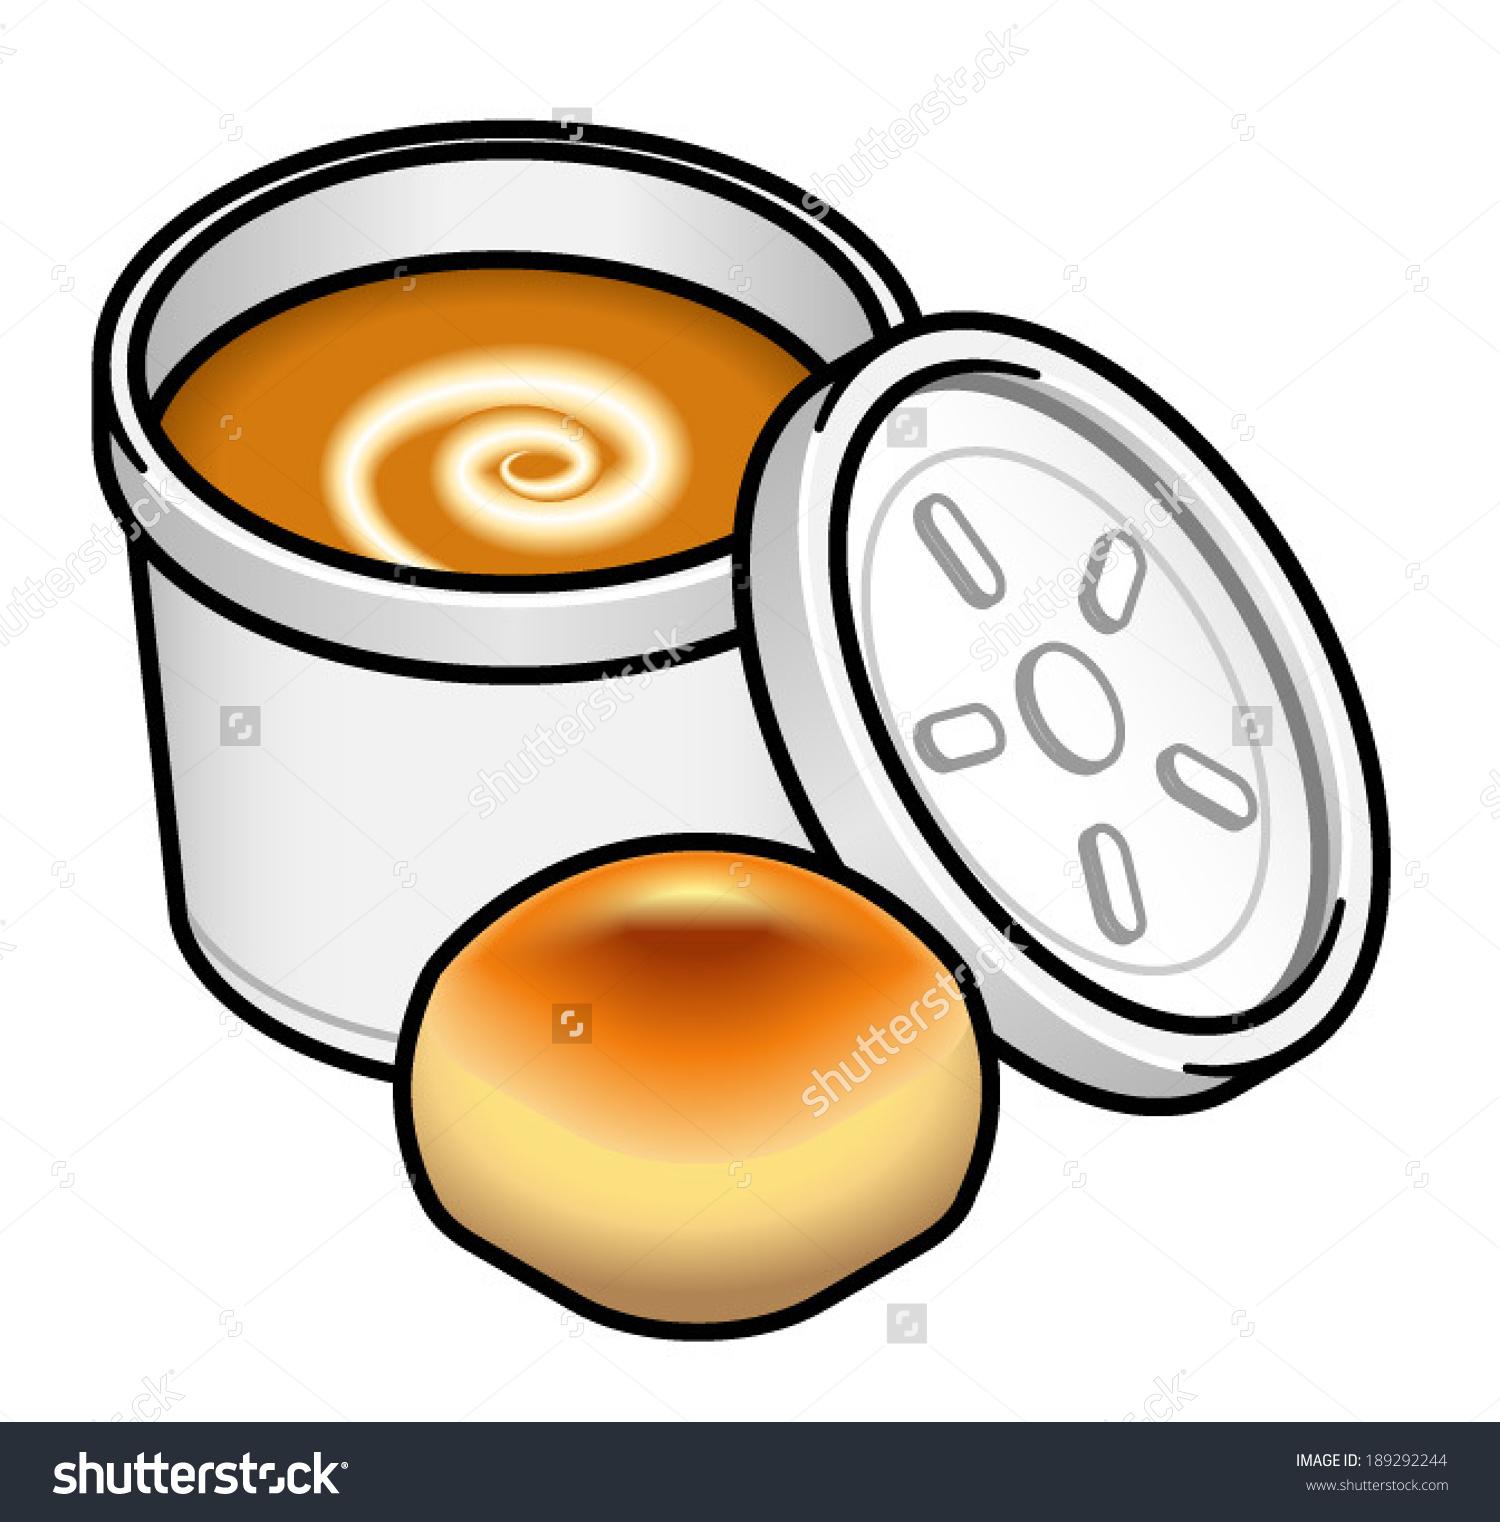 Soup and bread clip art.